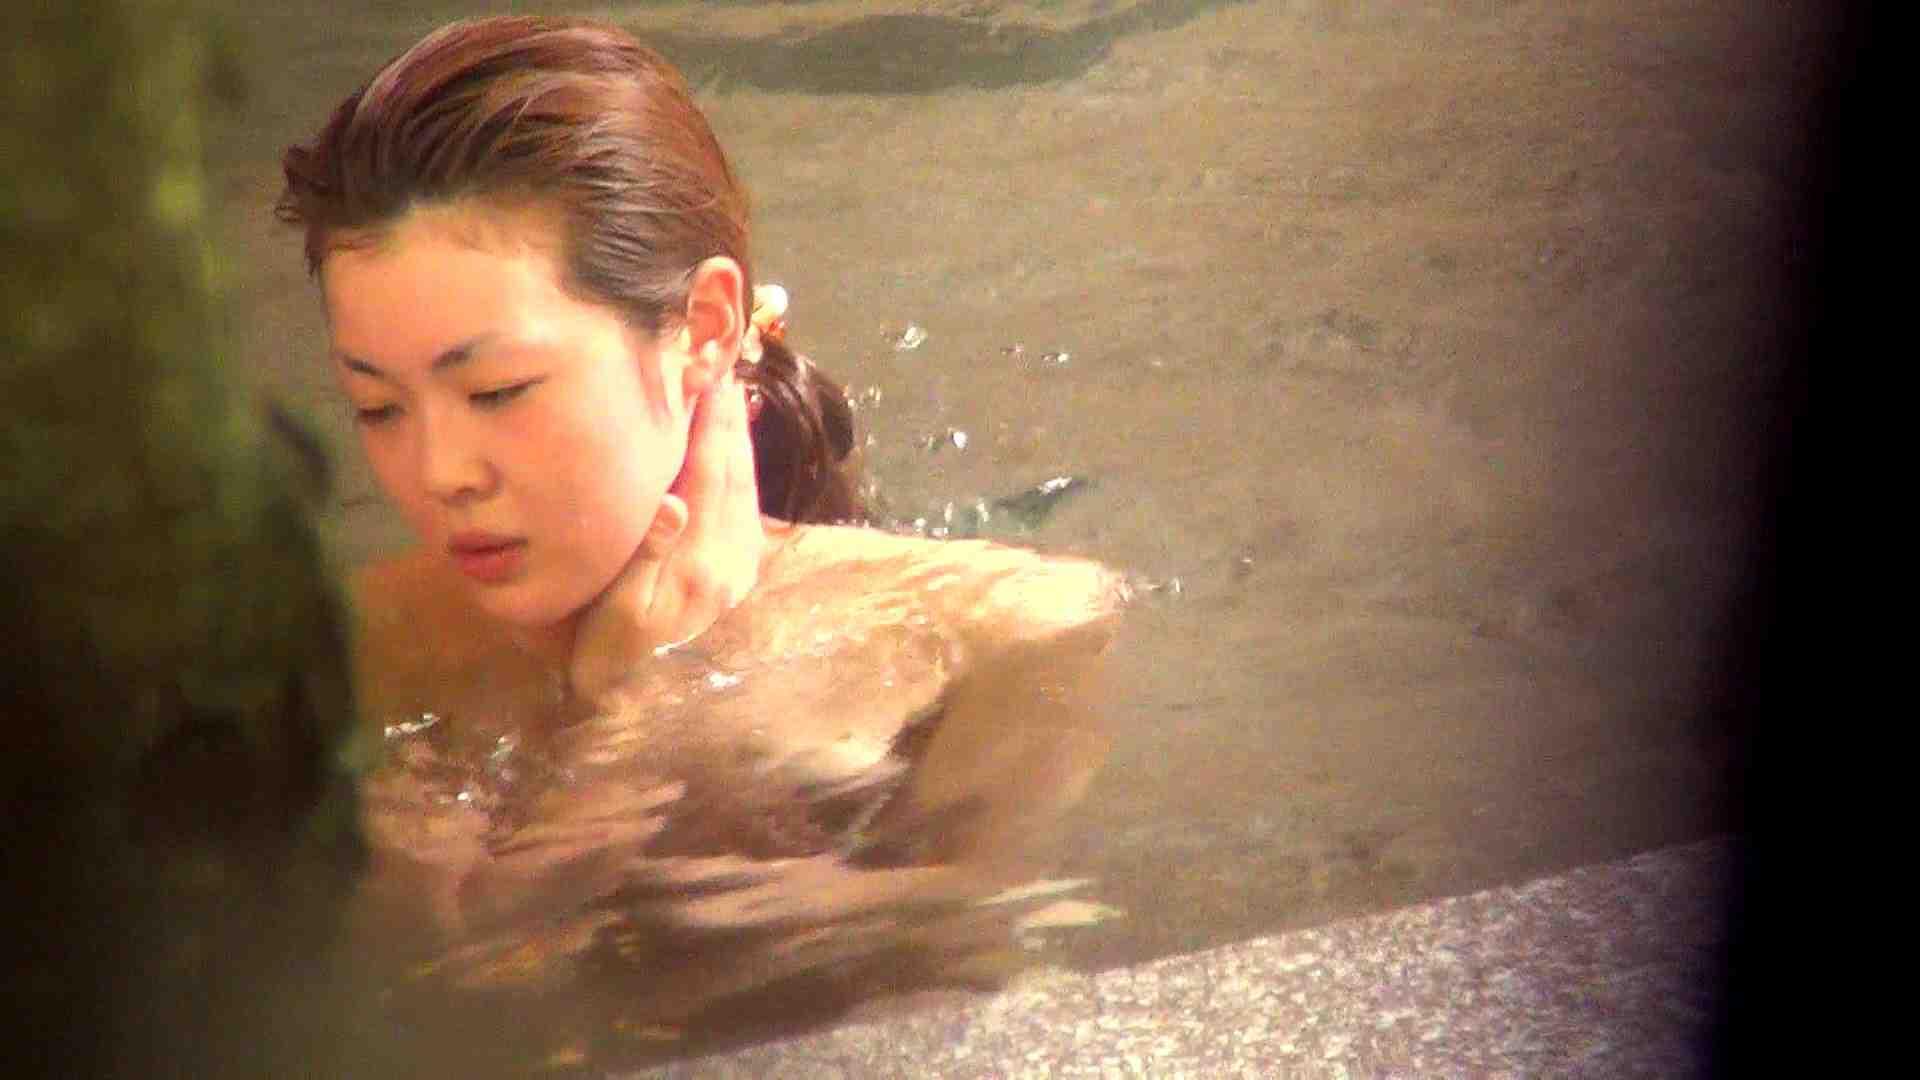 Aquaな露天風呂Vol.288 露天  85連発 79